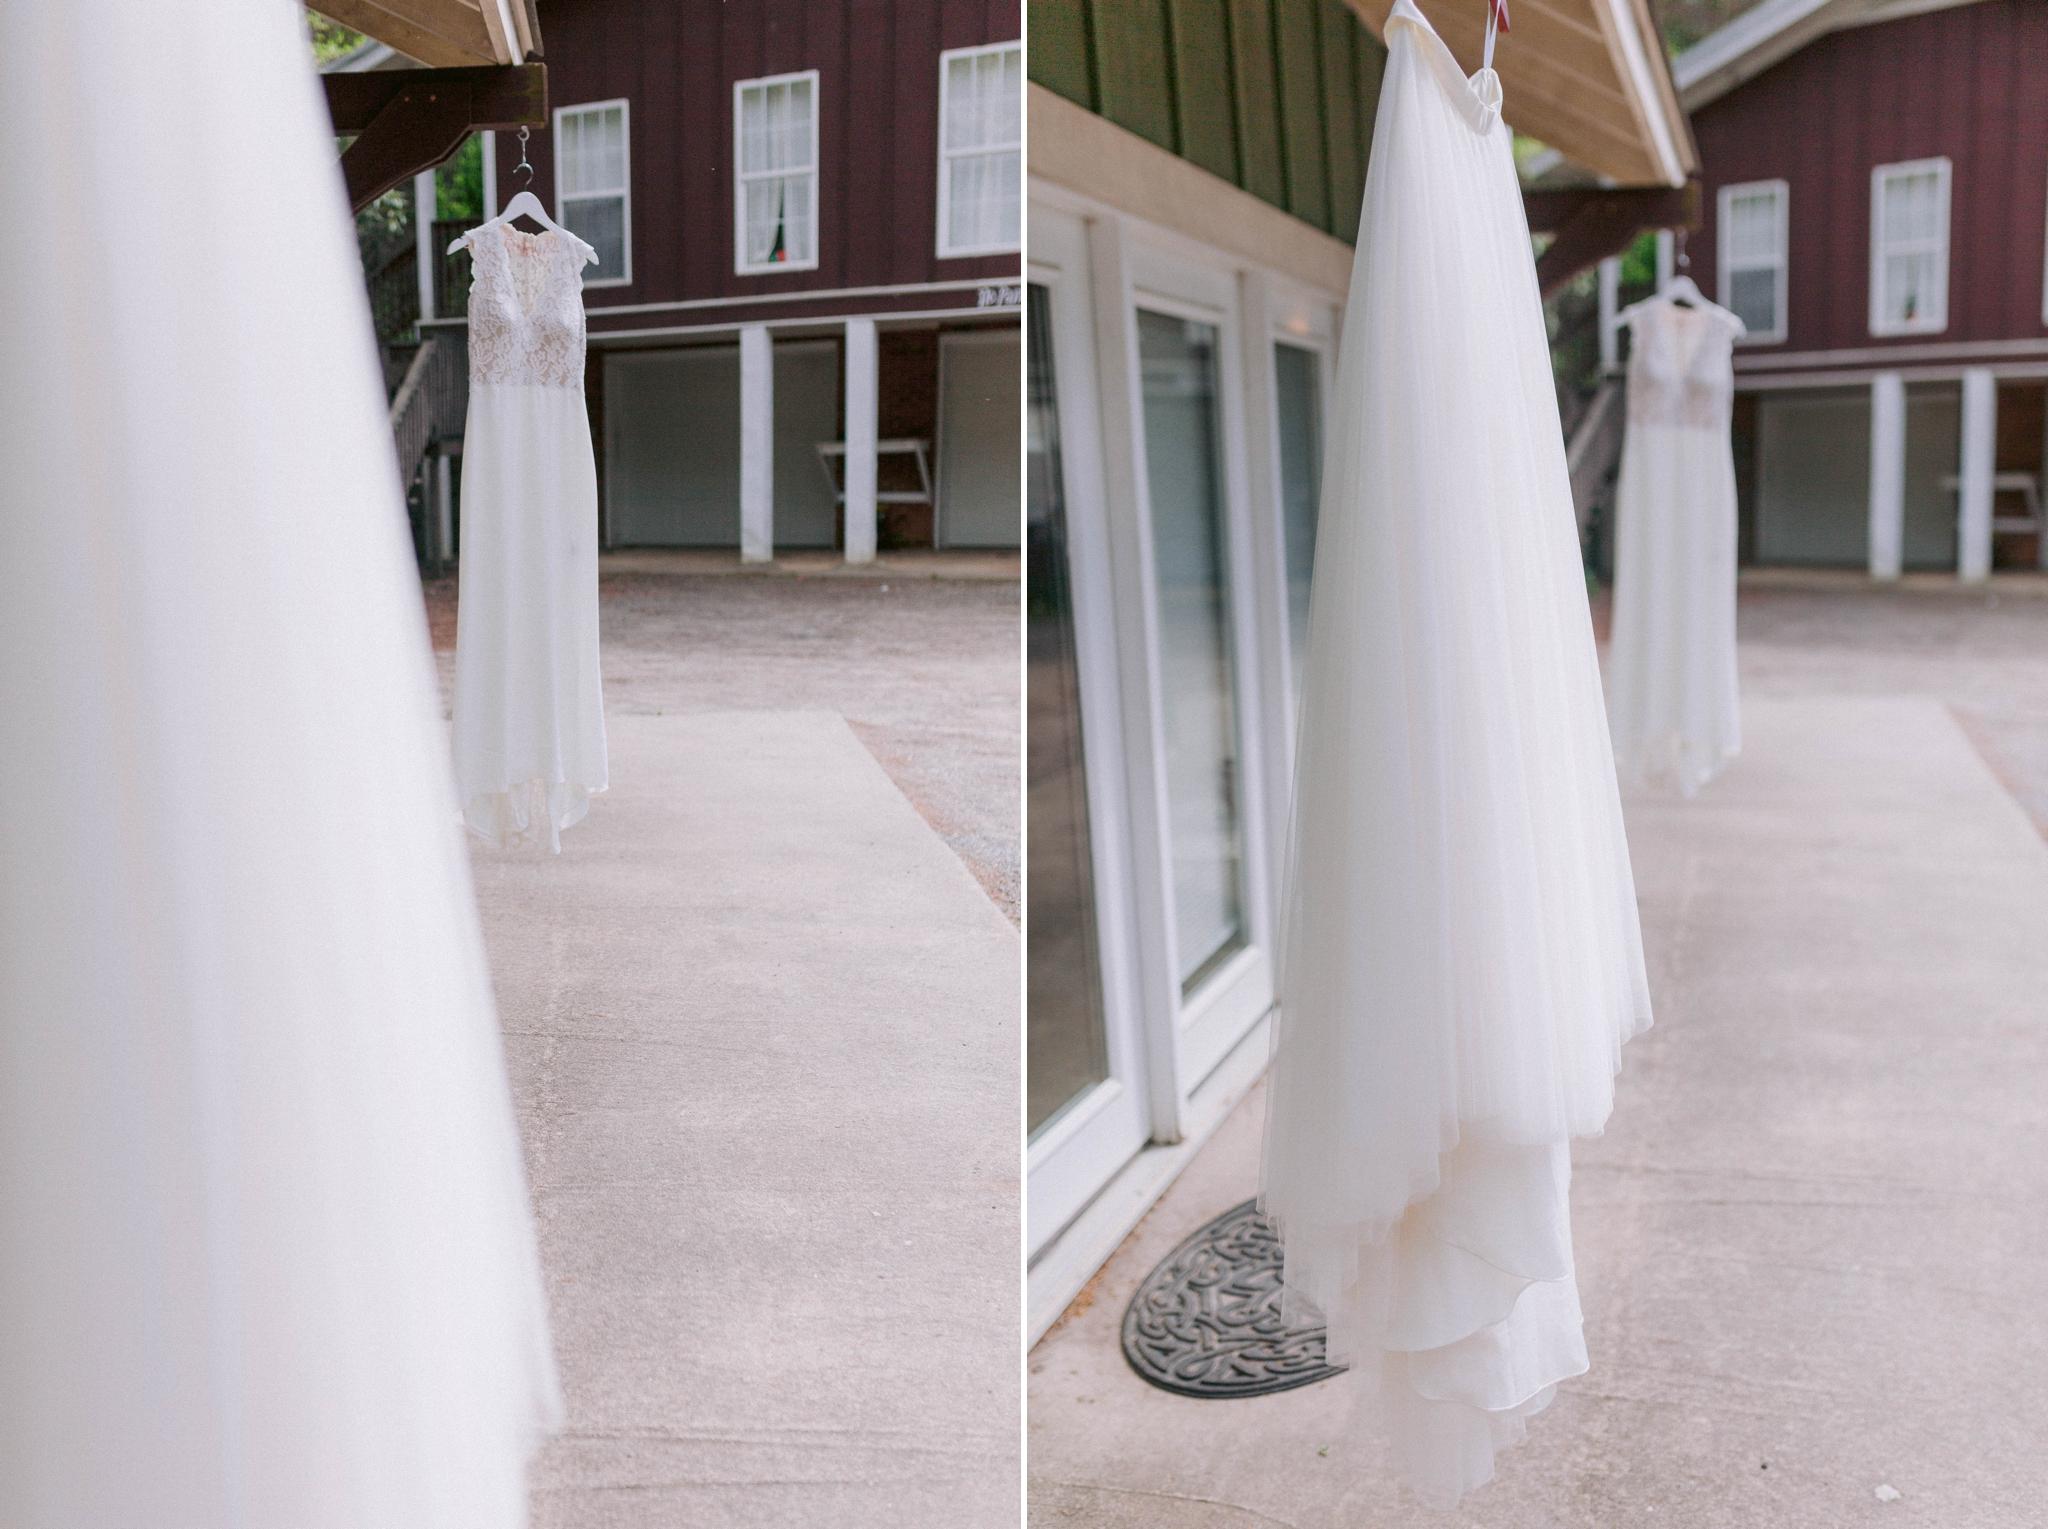 flowy skirt to go above the wedding dress - Honolulu Oahu Hawaii Wedding Photographer